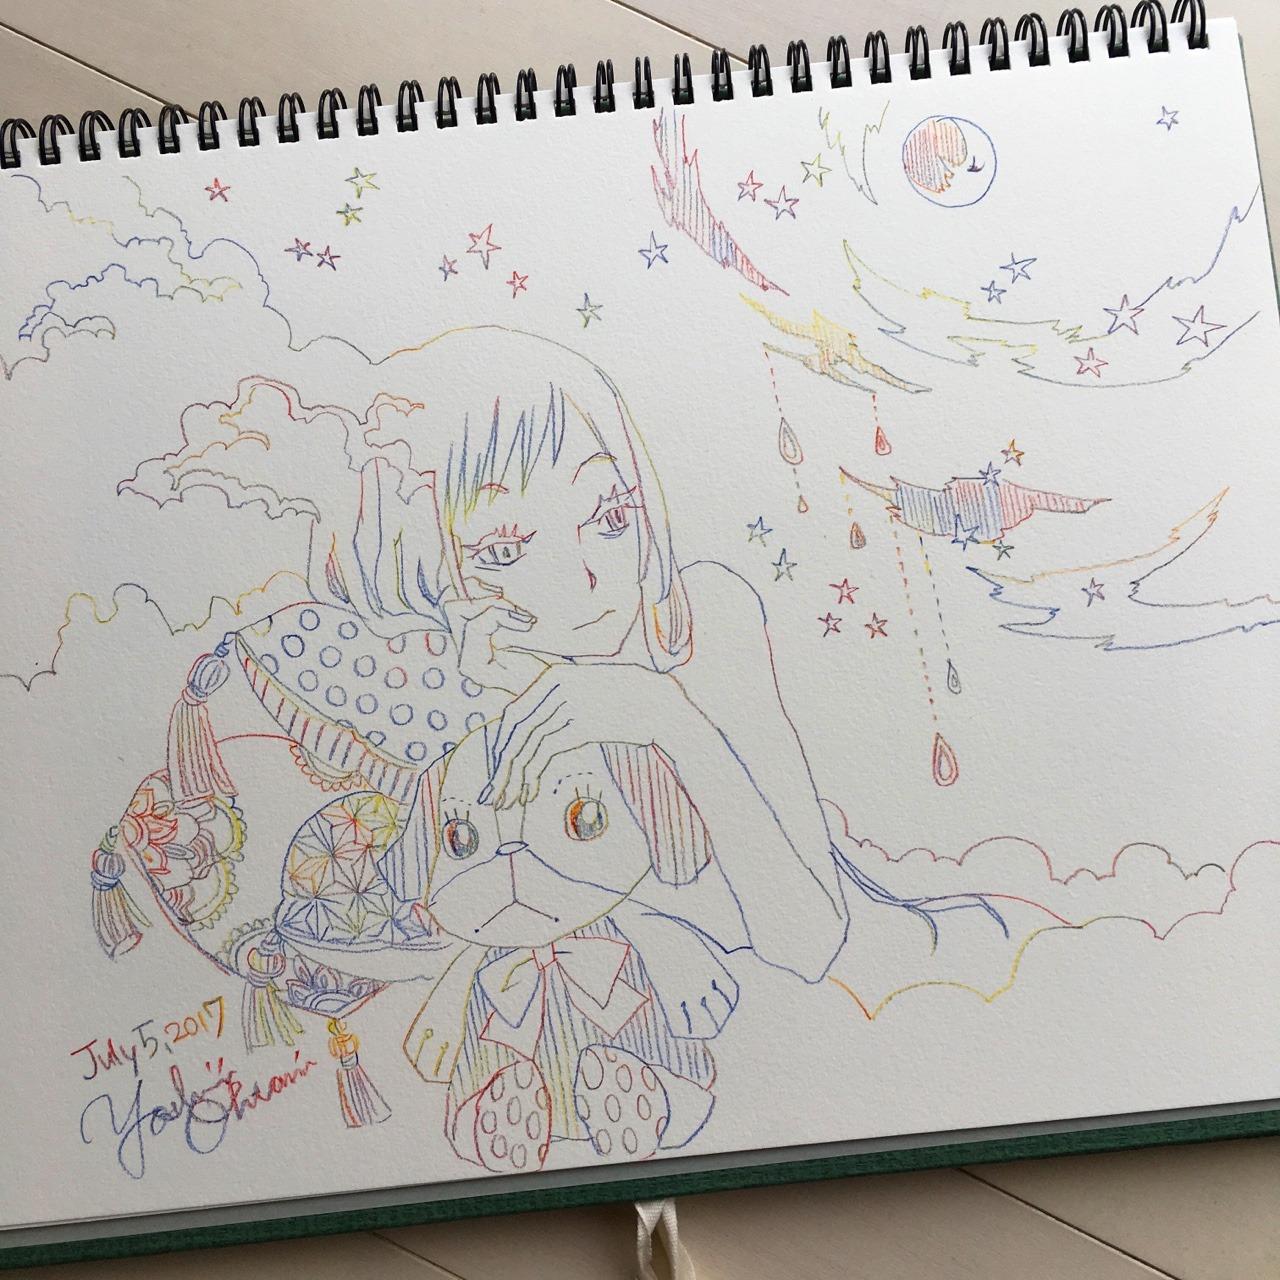 Drawn stare scribble 2017 funarium sky July Today's